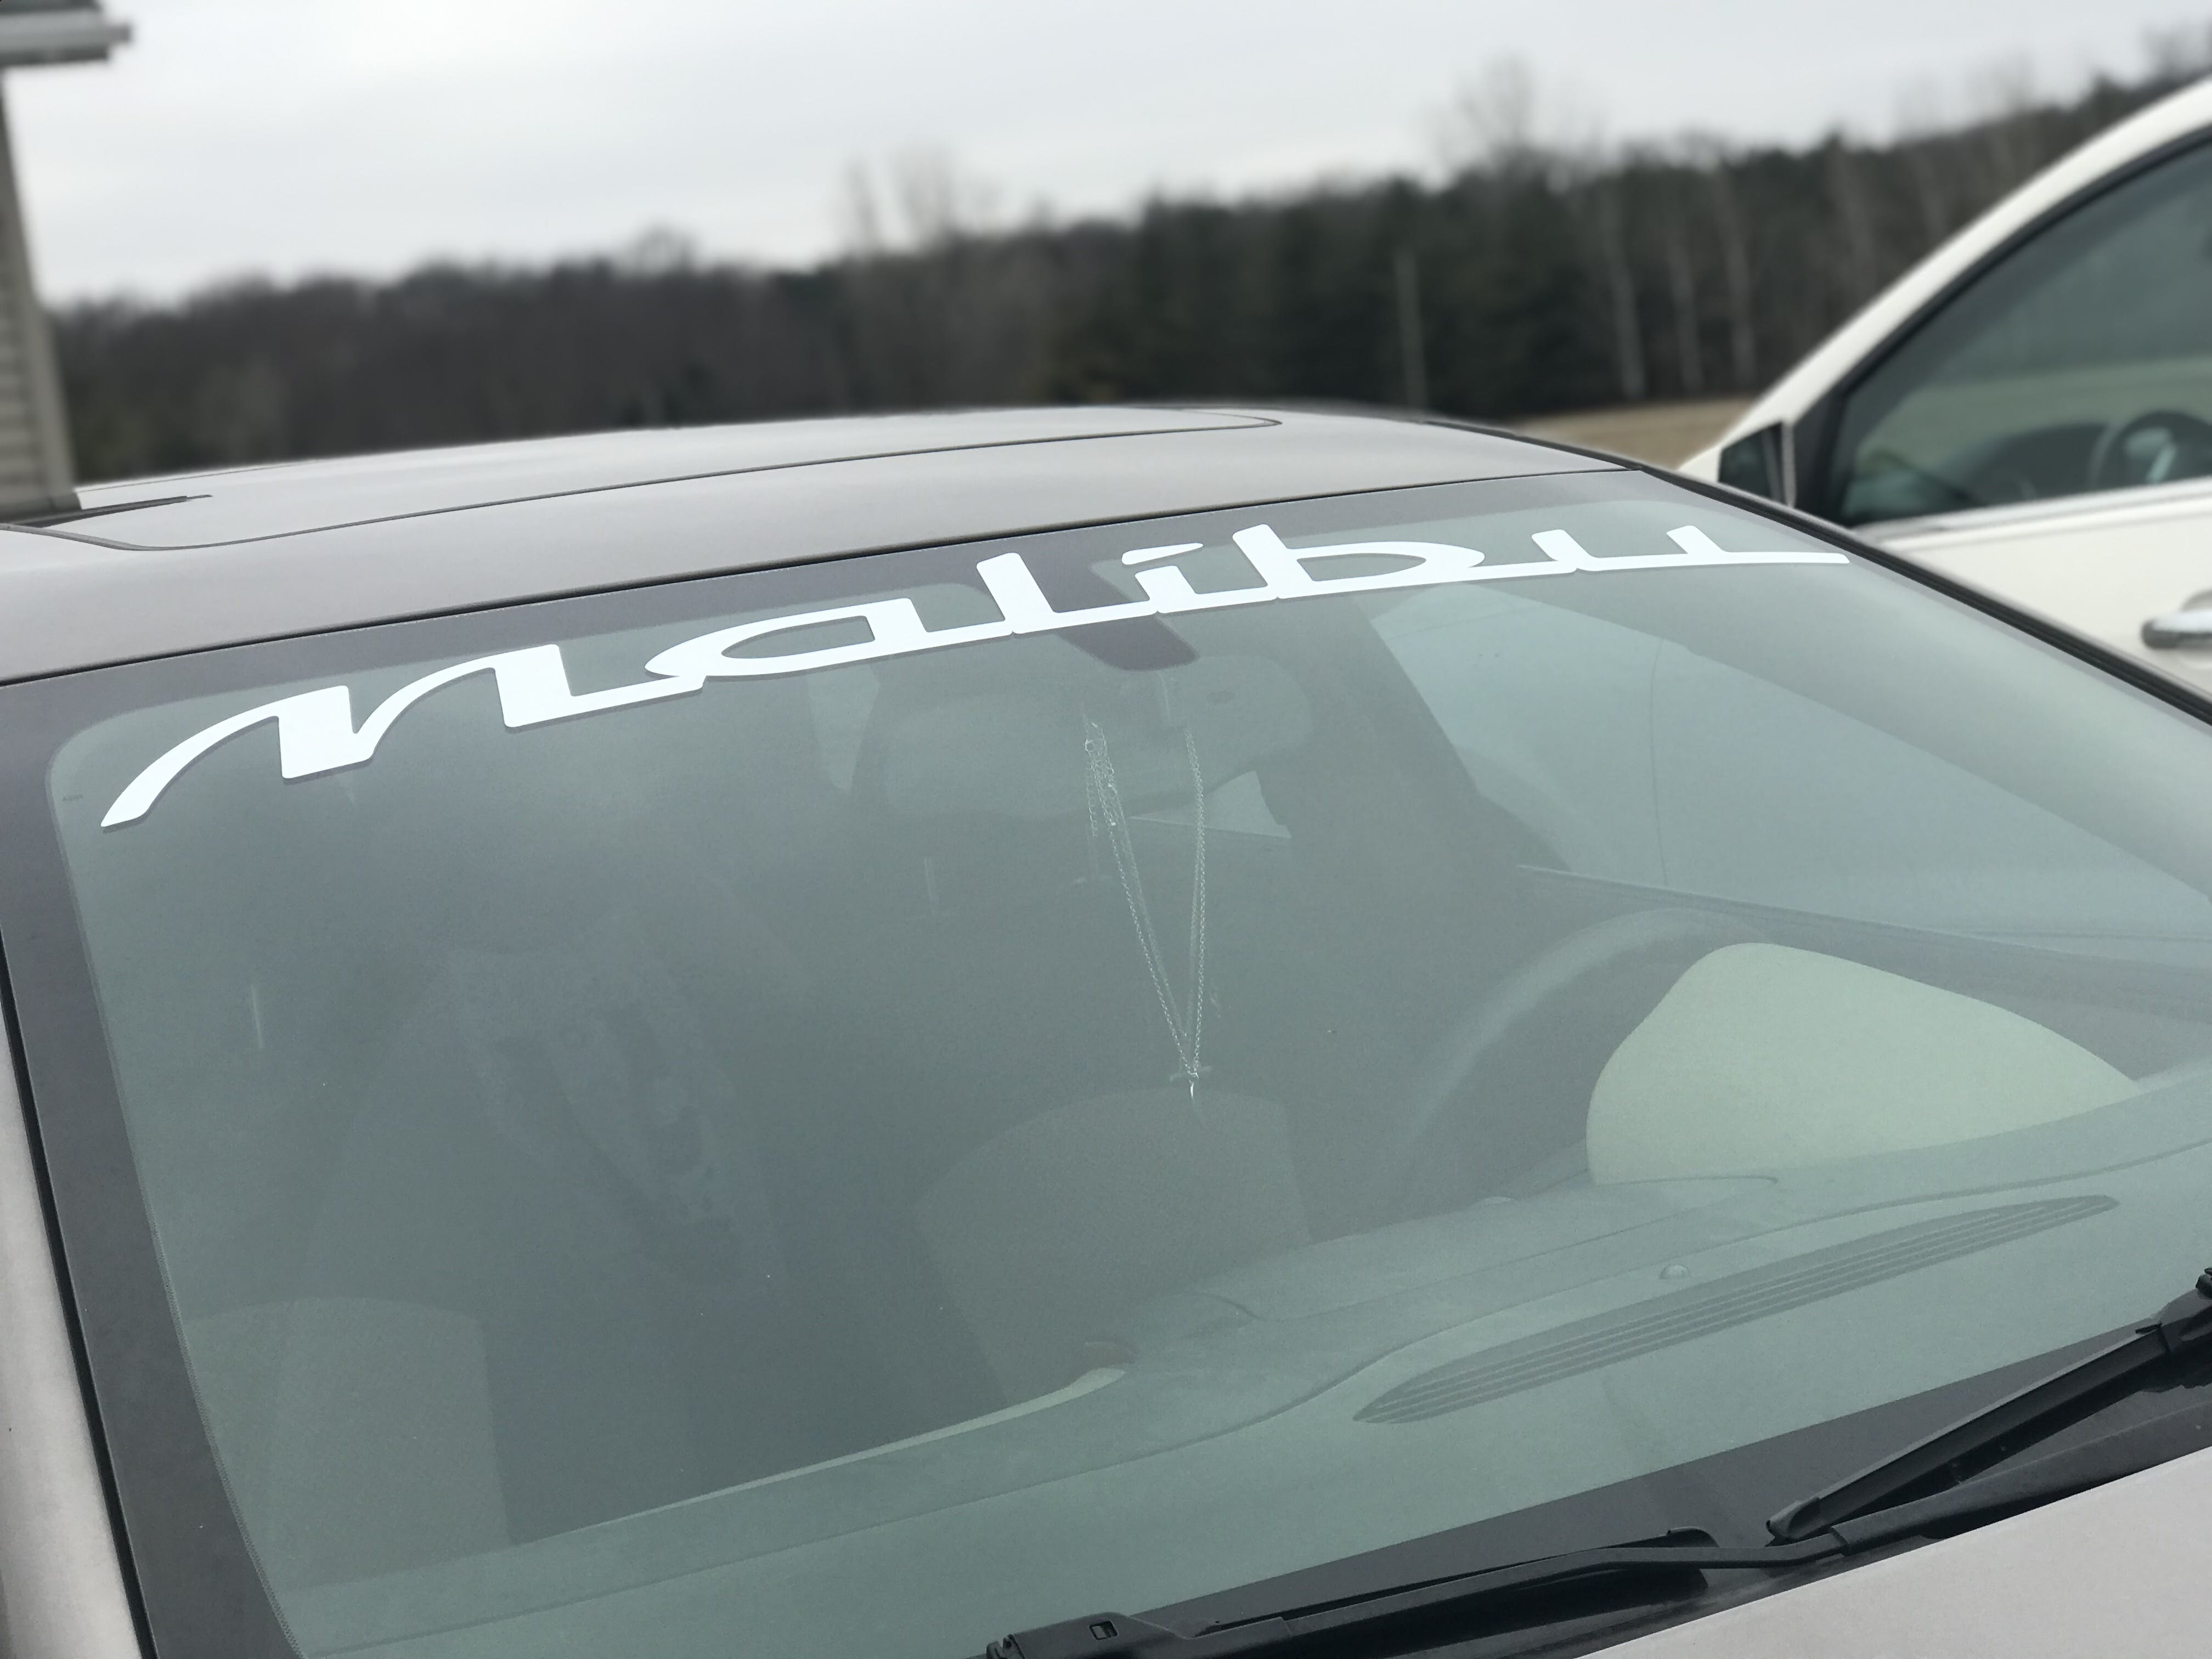 Chevy Malibu Windshield Banner Decal Sticker